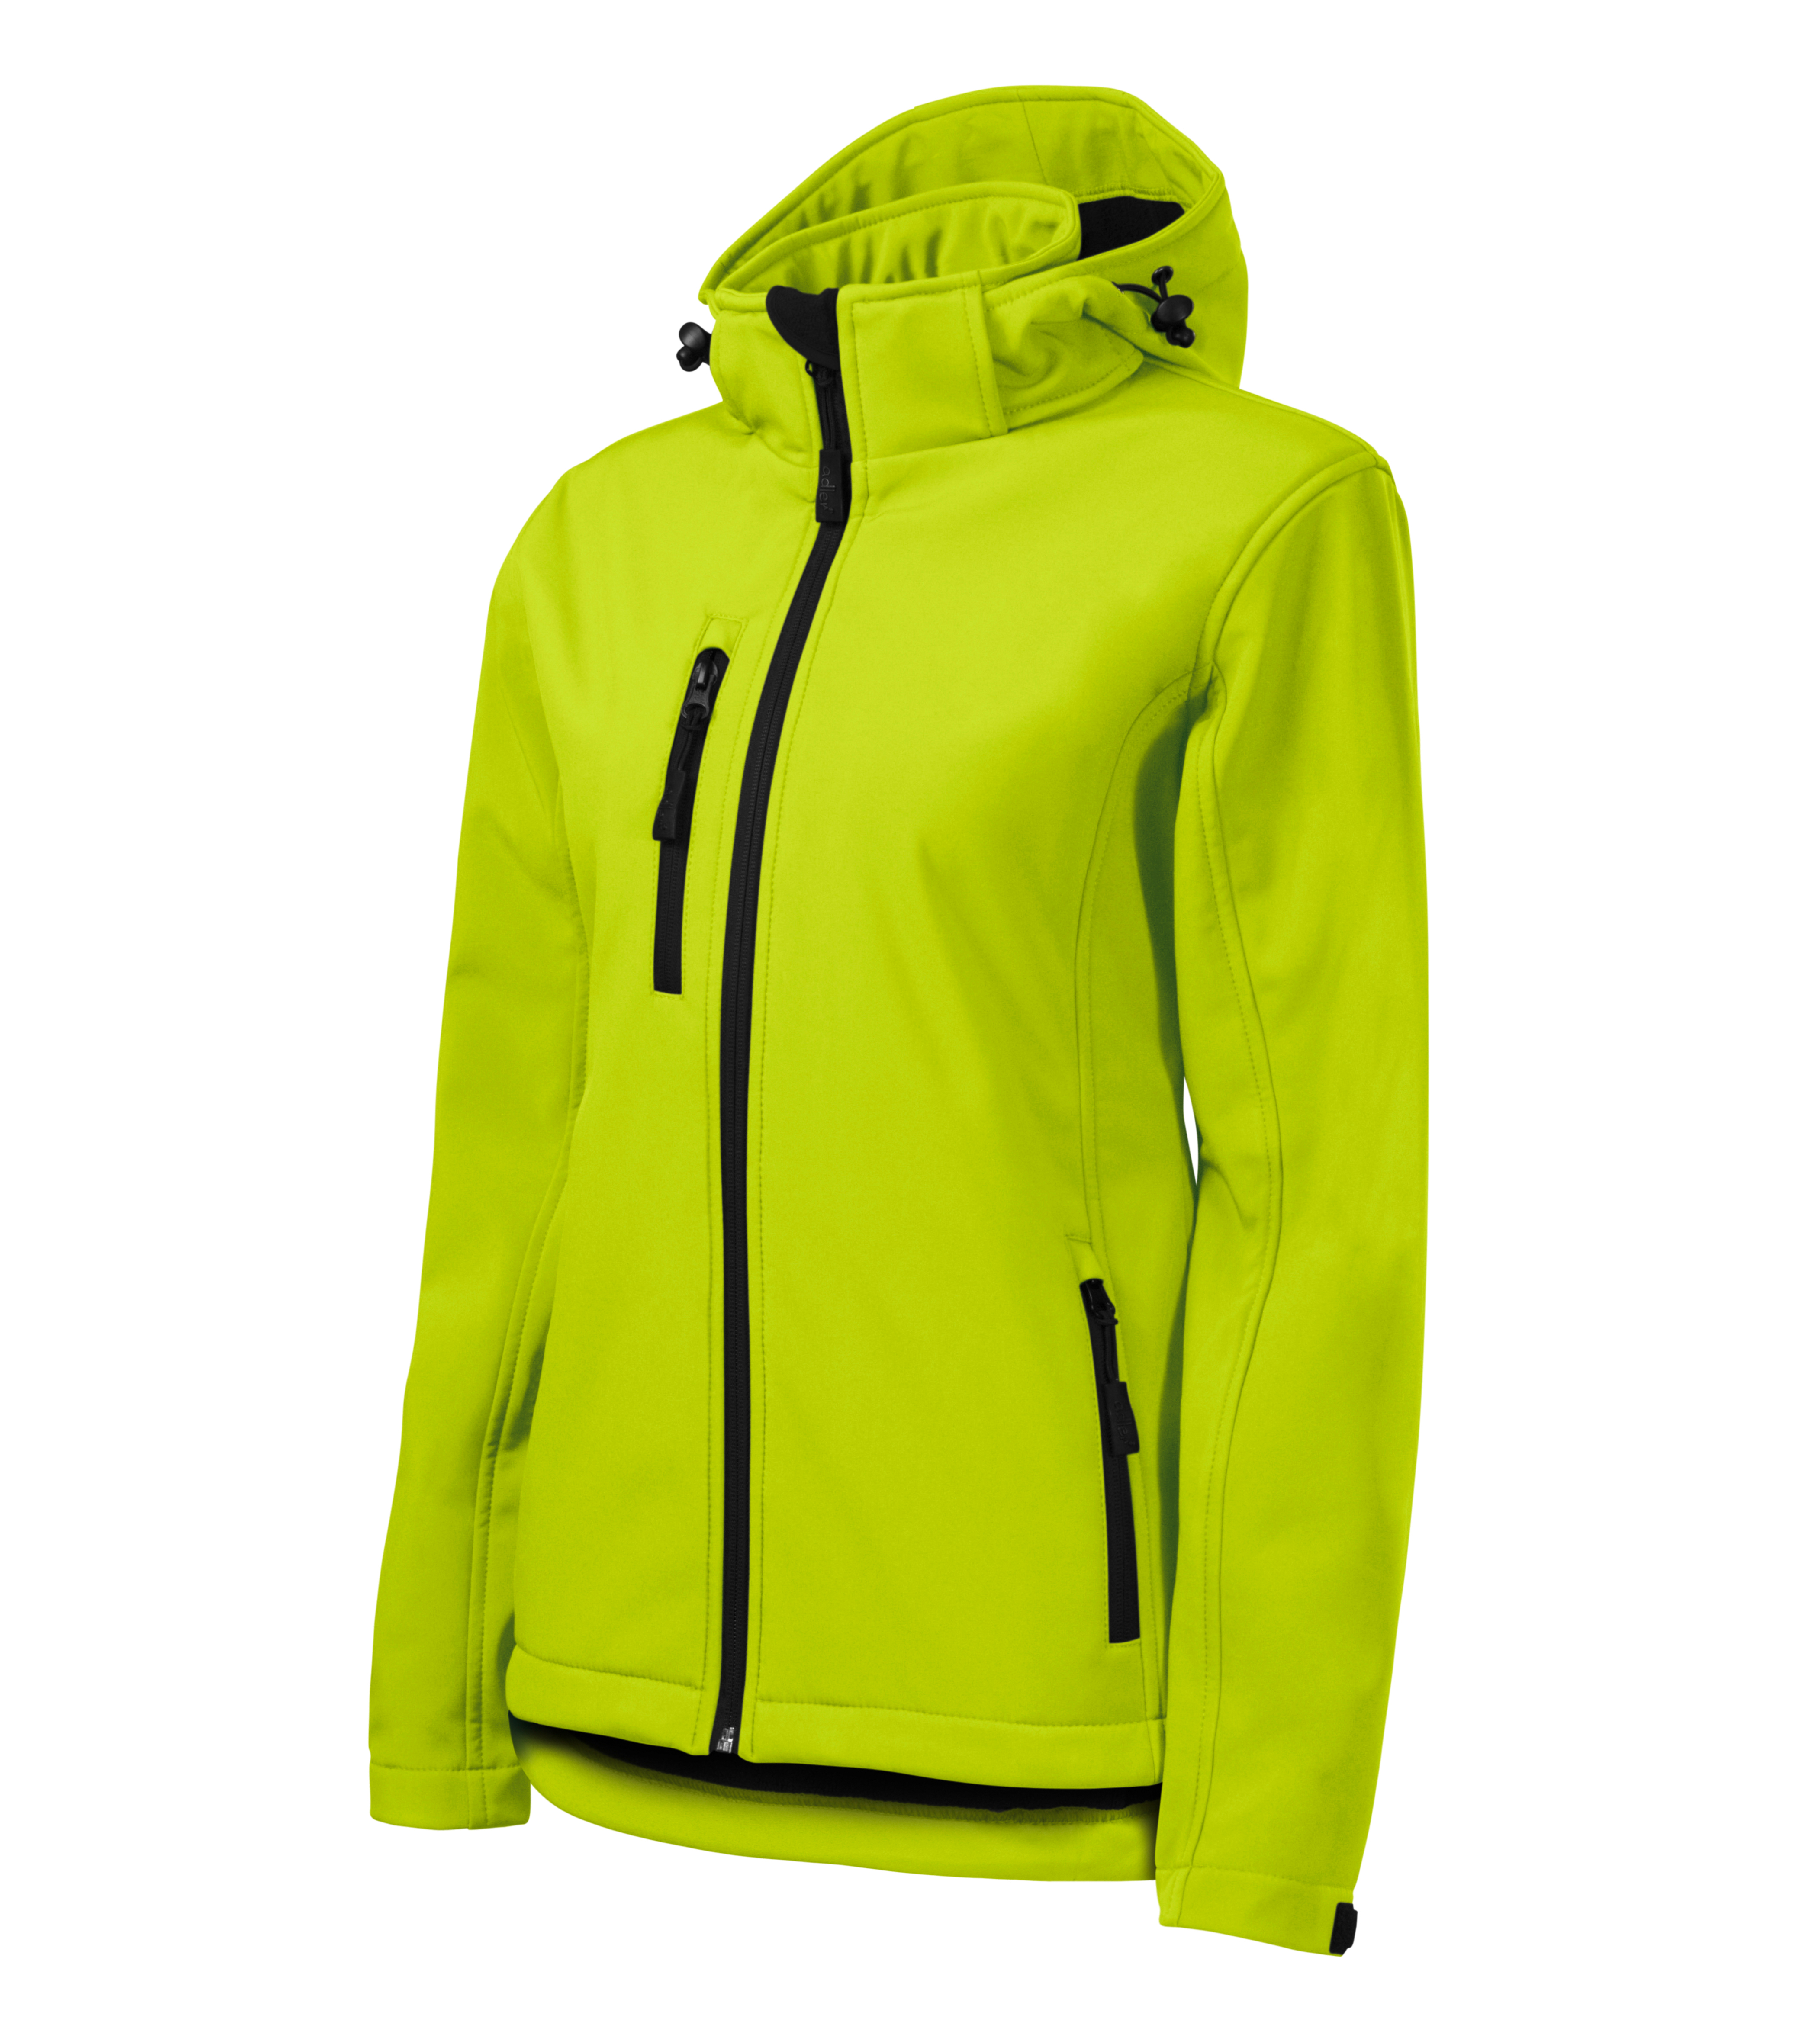 Limonkowa kurtka softshell Performance damska